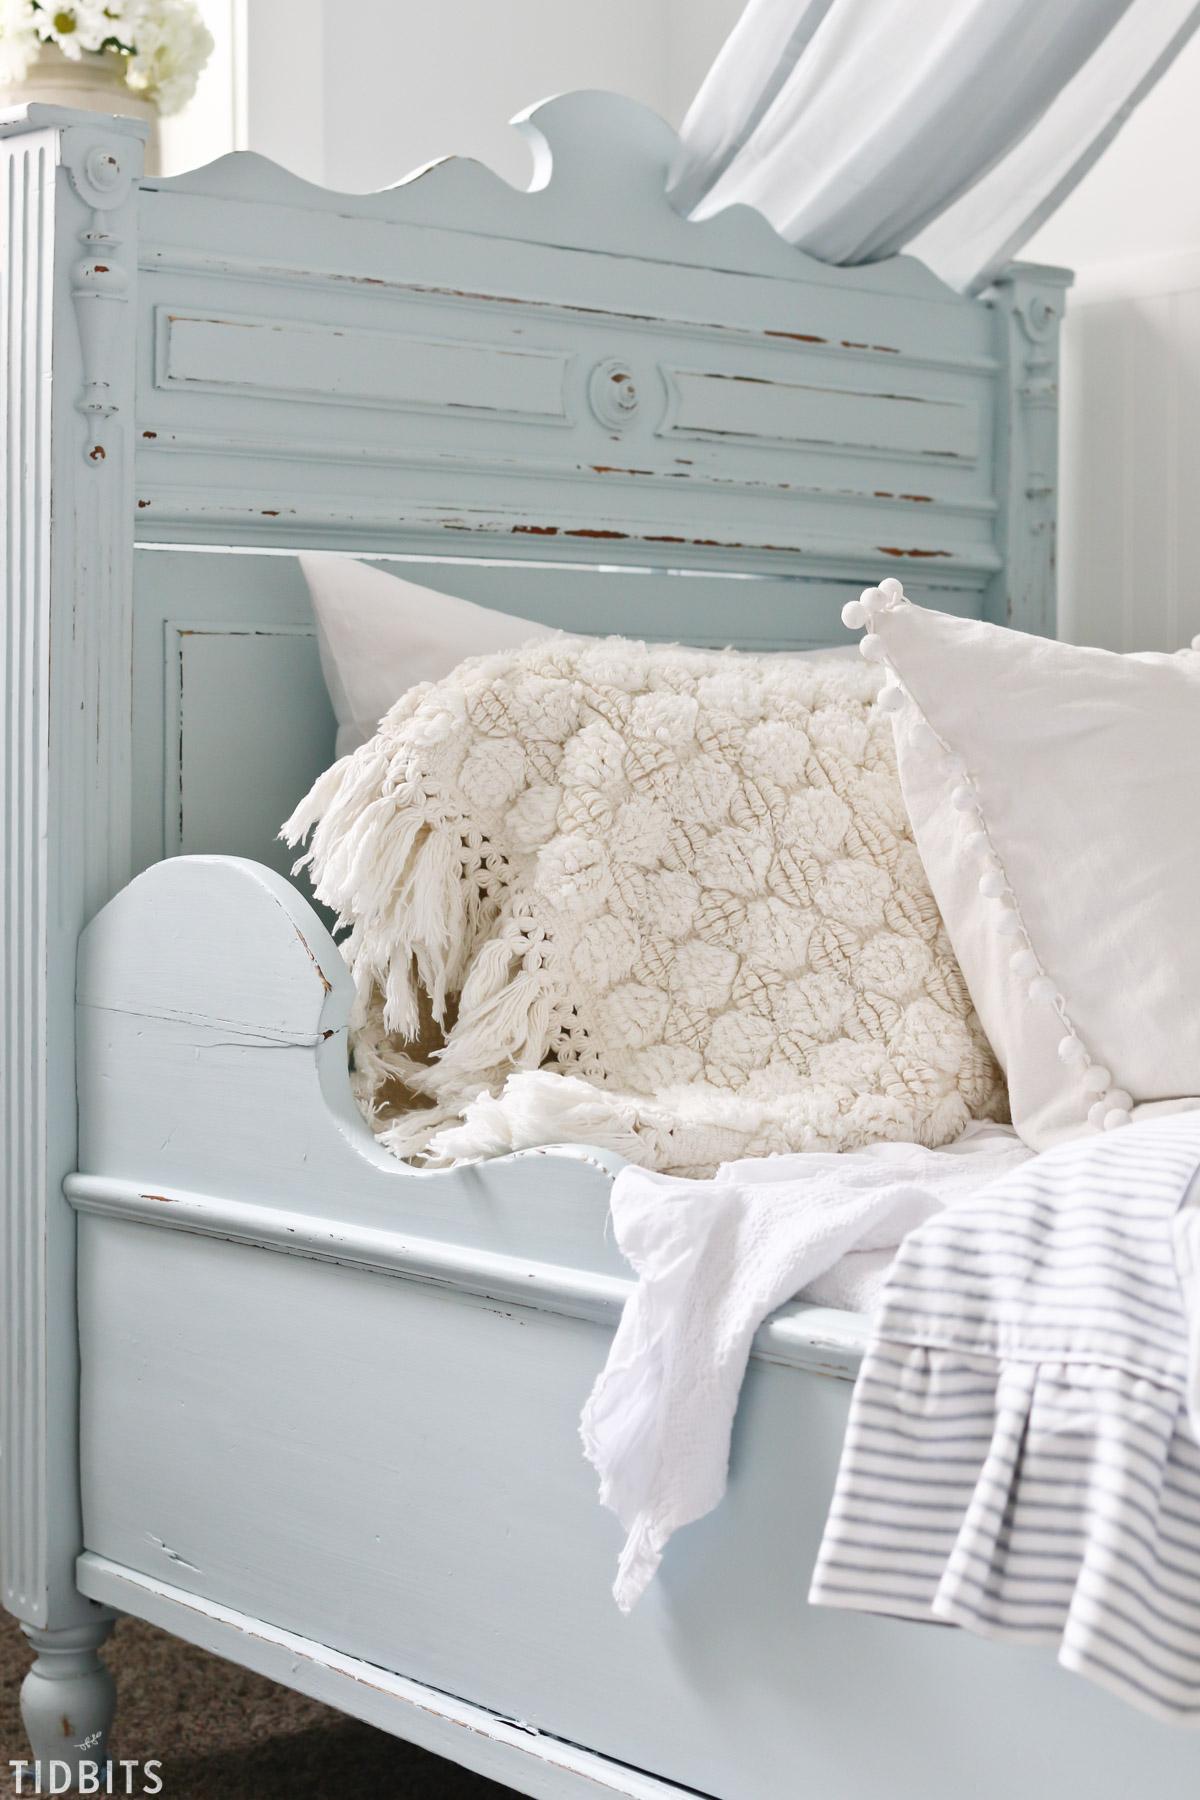 DIY Bath Mat Pillow TIDBITS